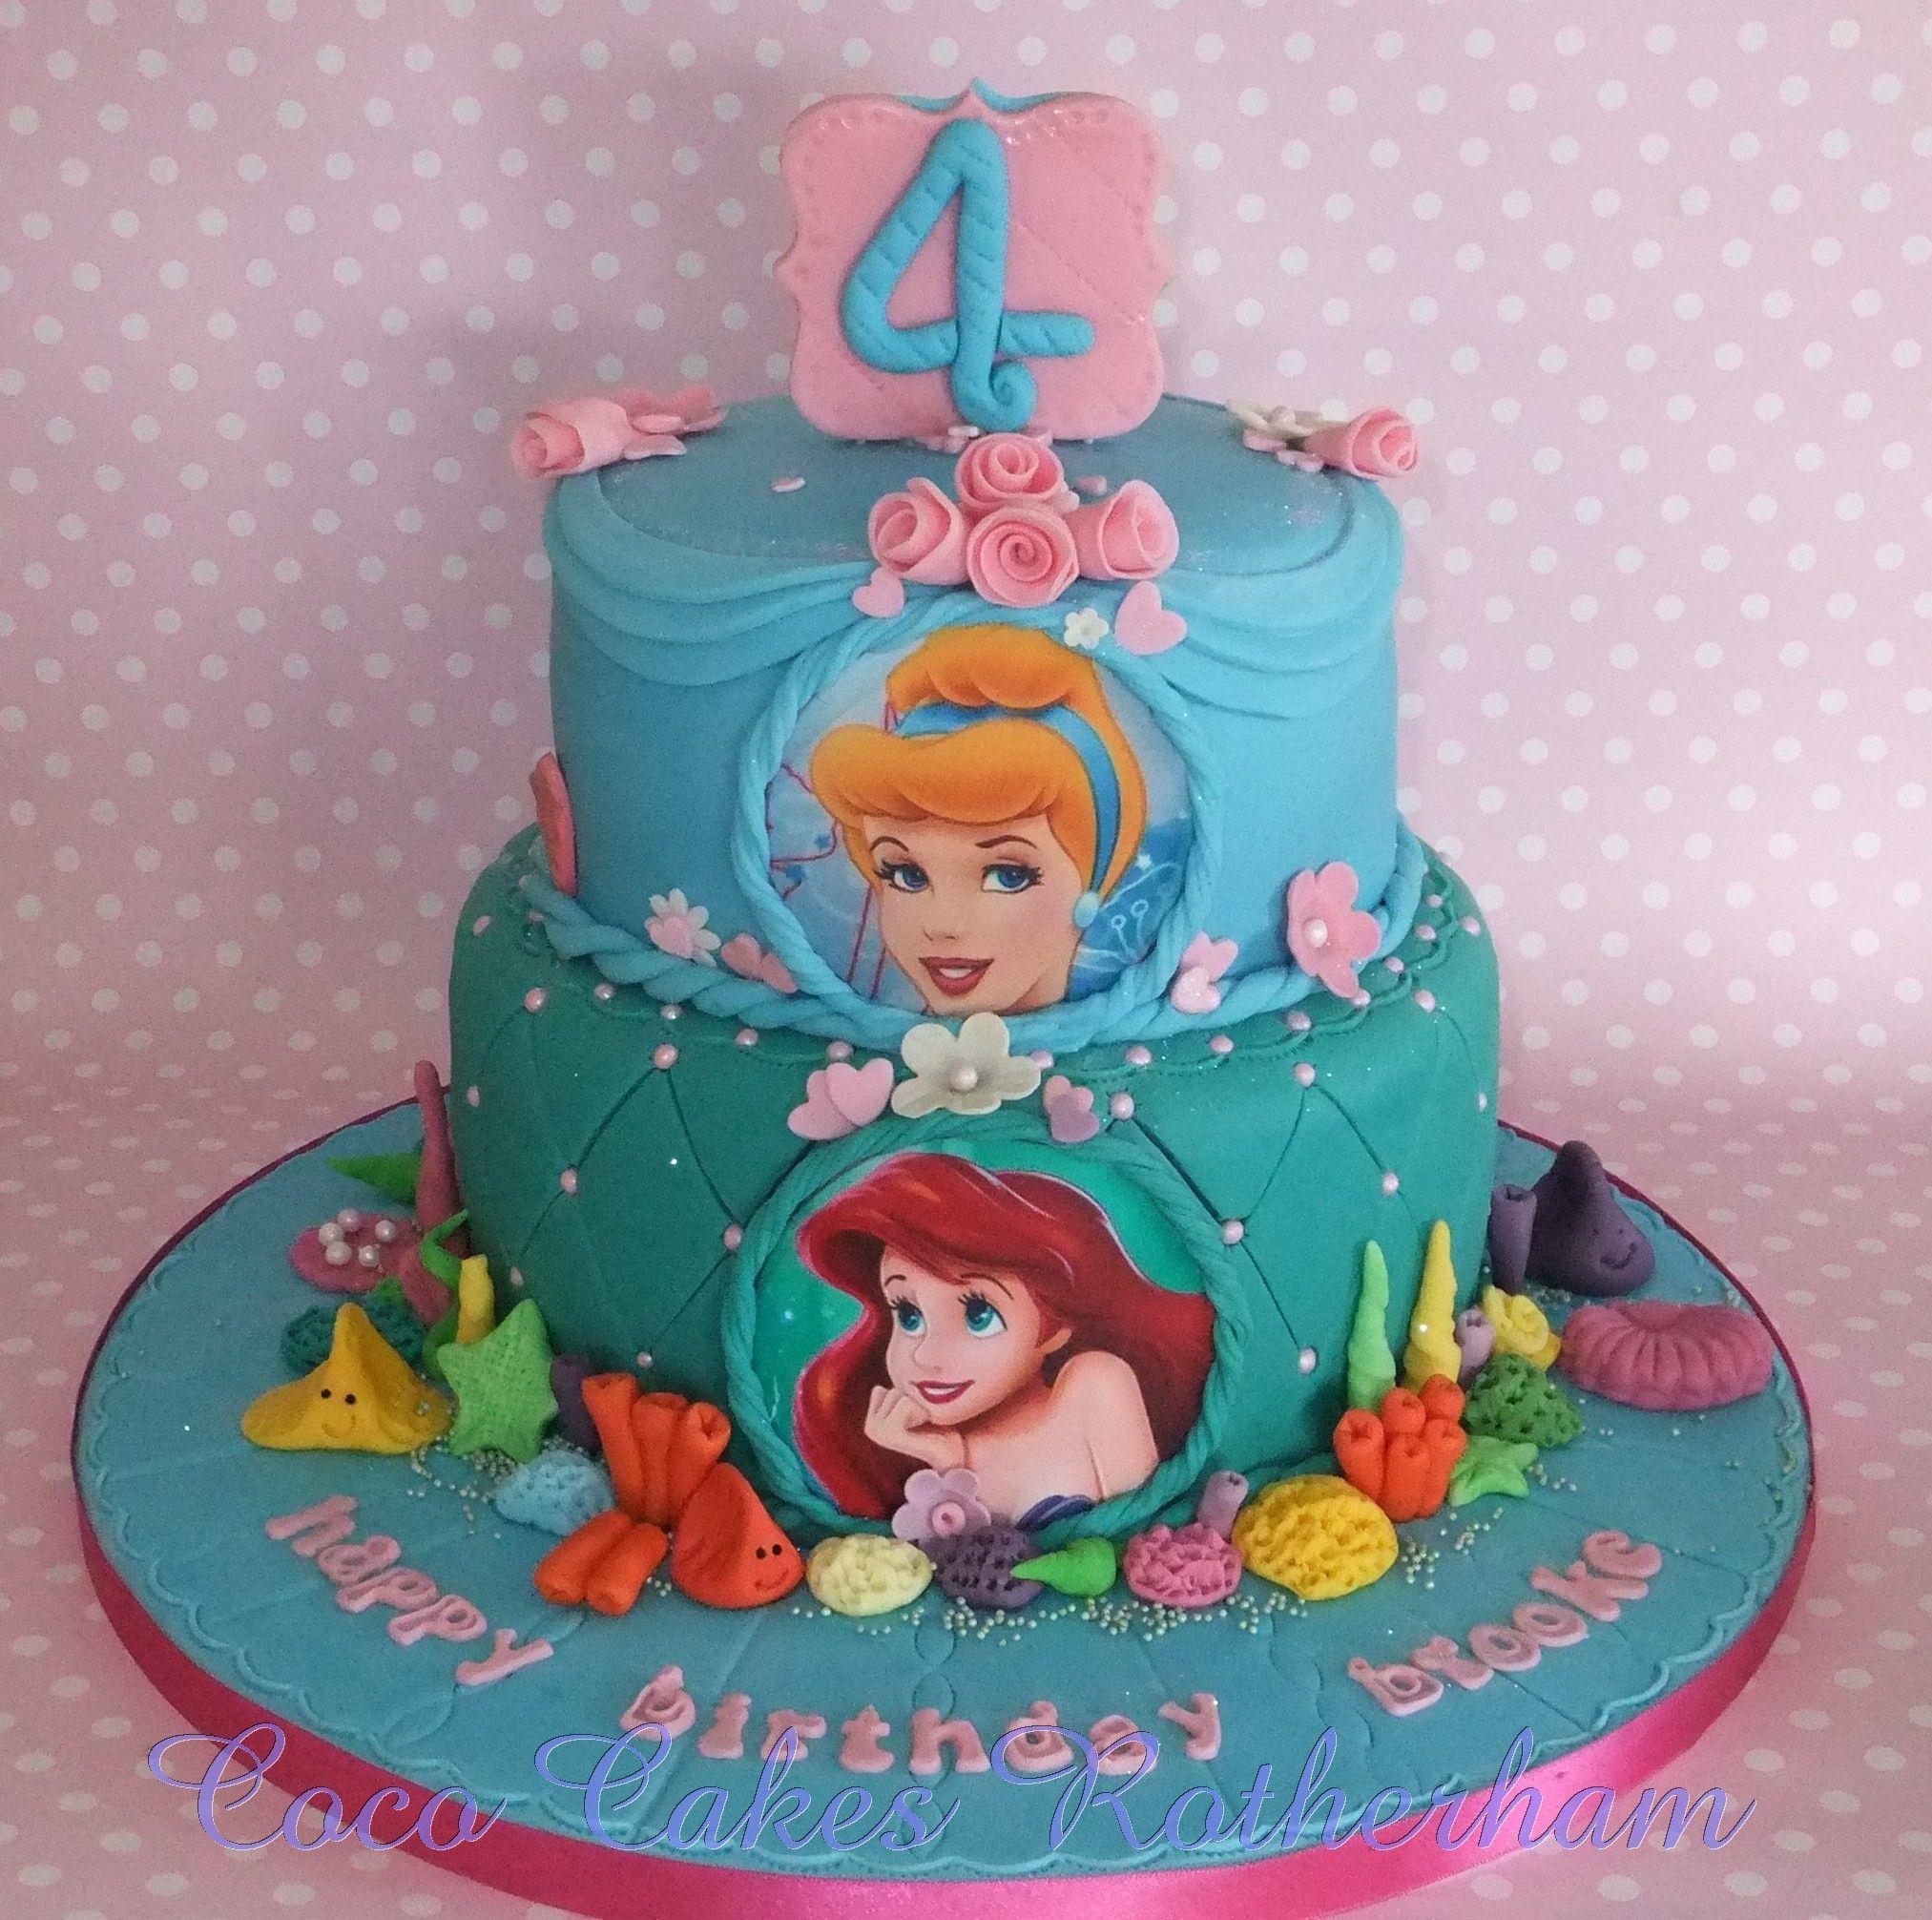 Princess Aurora Cake Design : Aurora & Ariel birthday cake design Disney cakes Pinterest